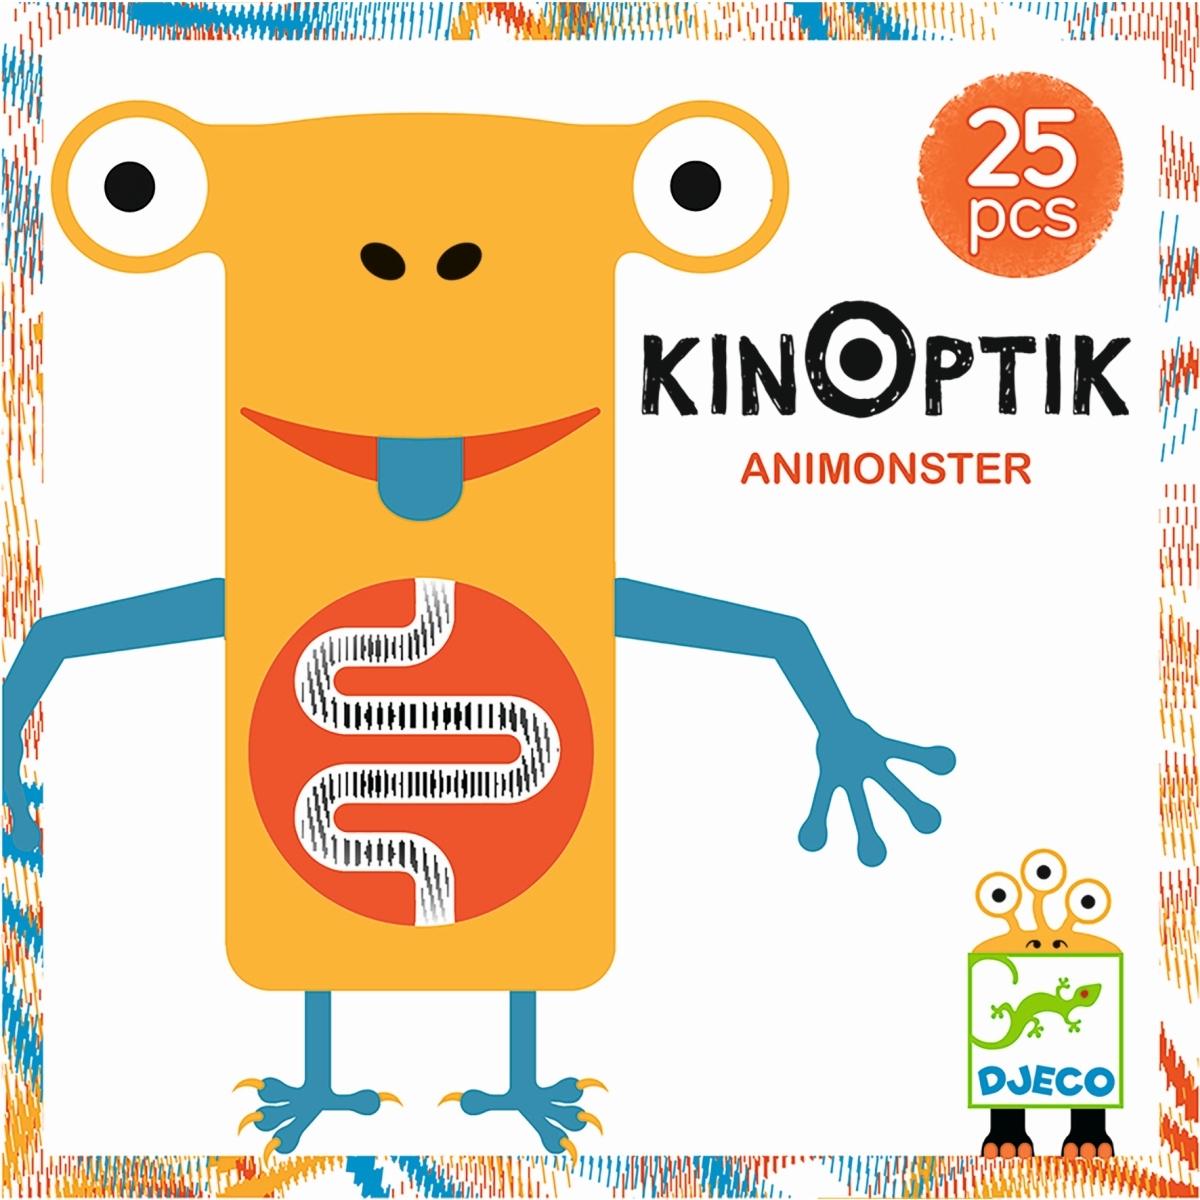 Djeco - Kinoptic Animonster